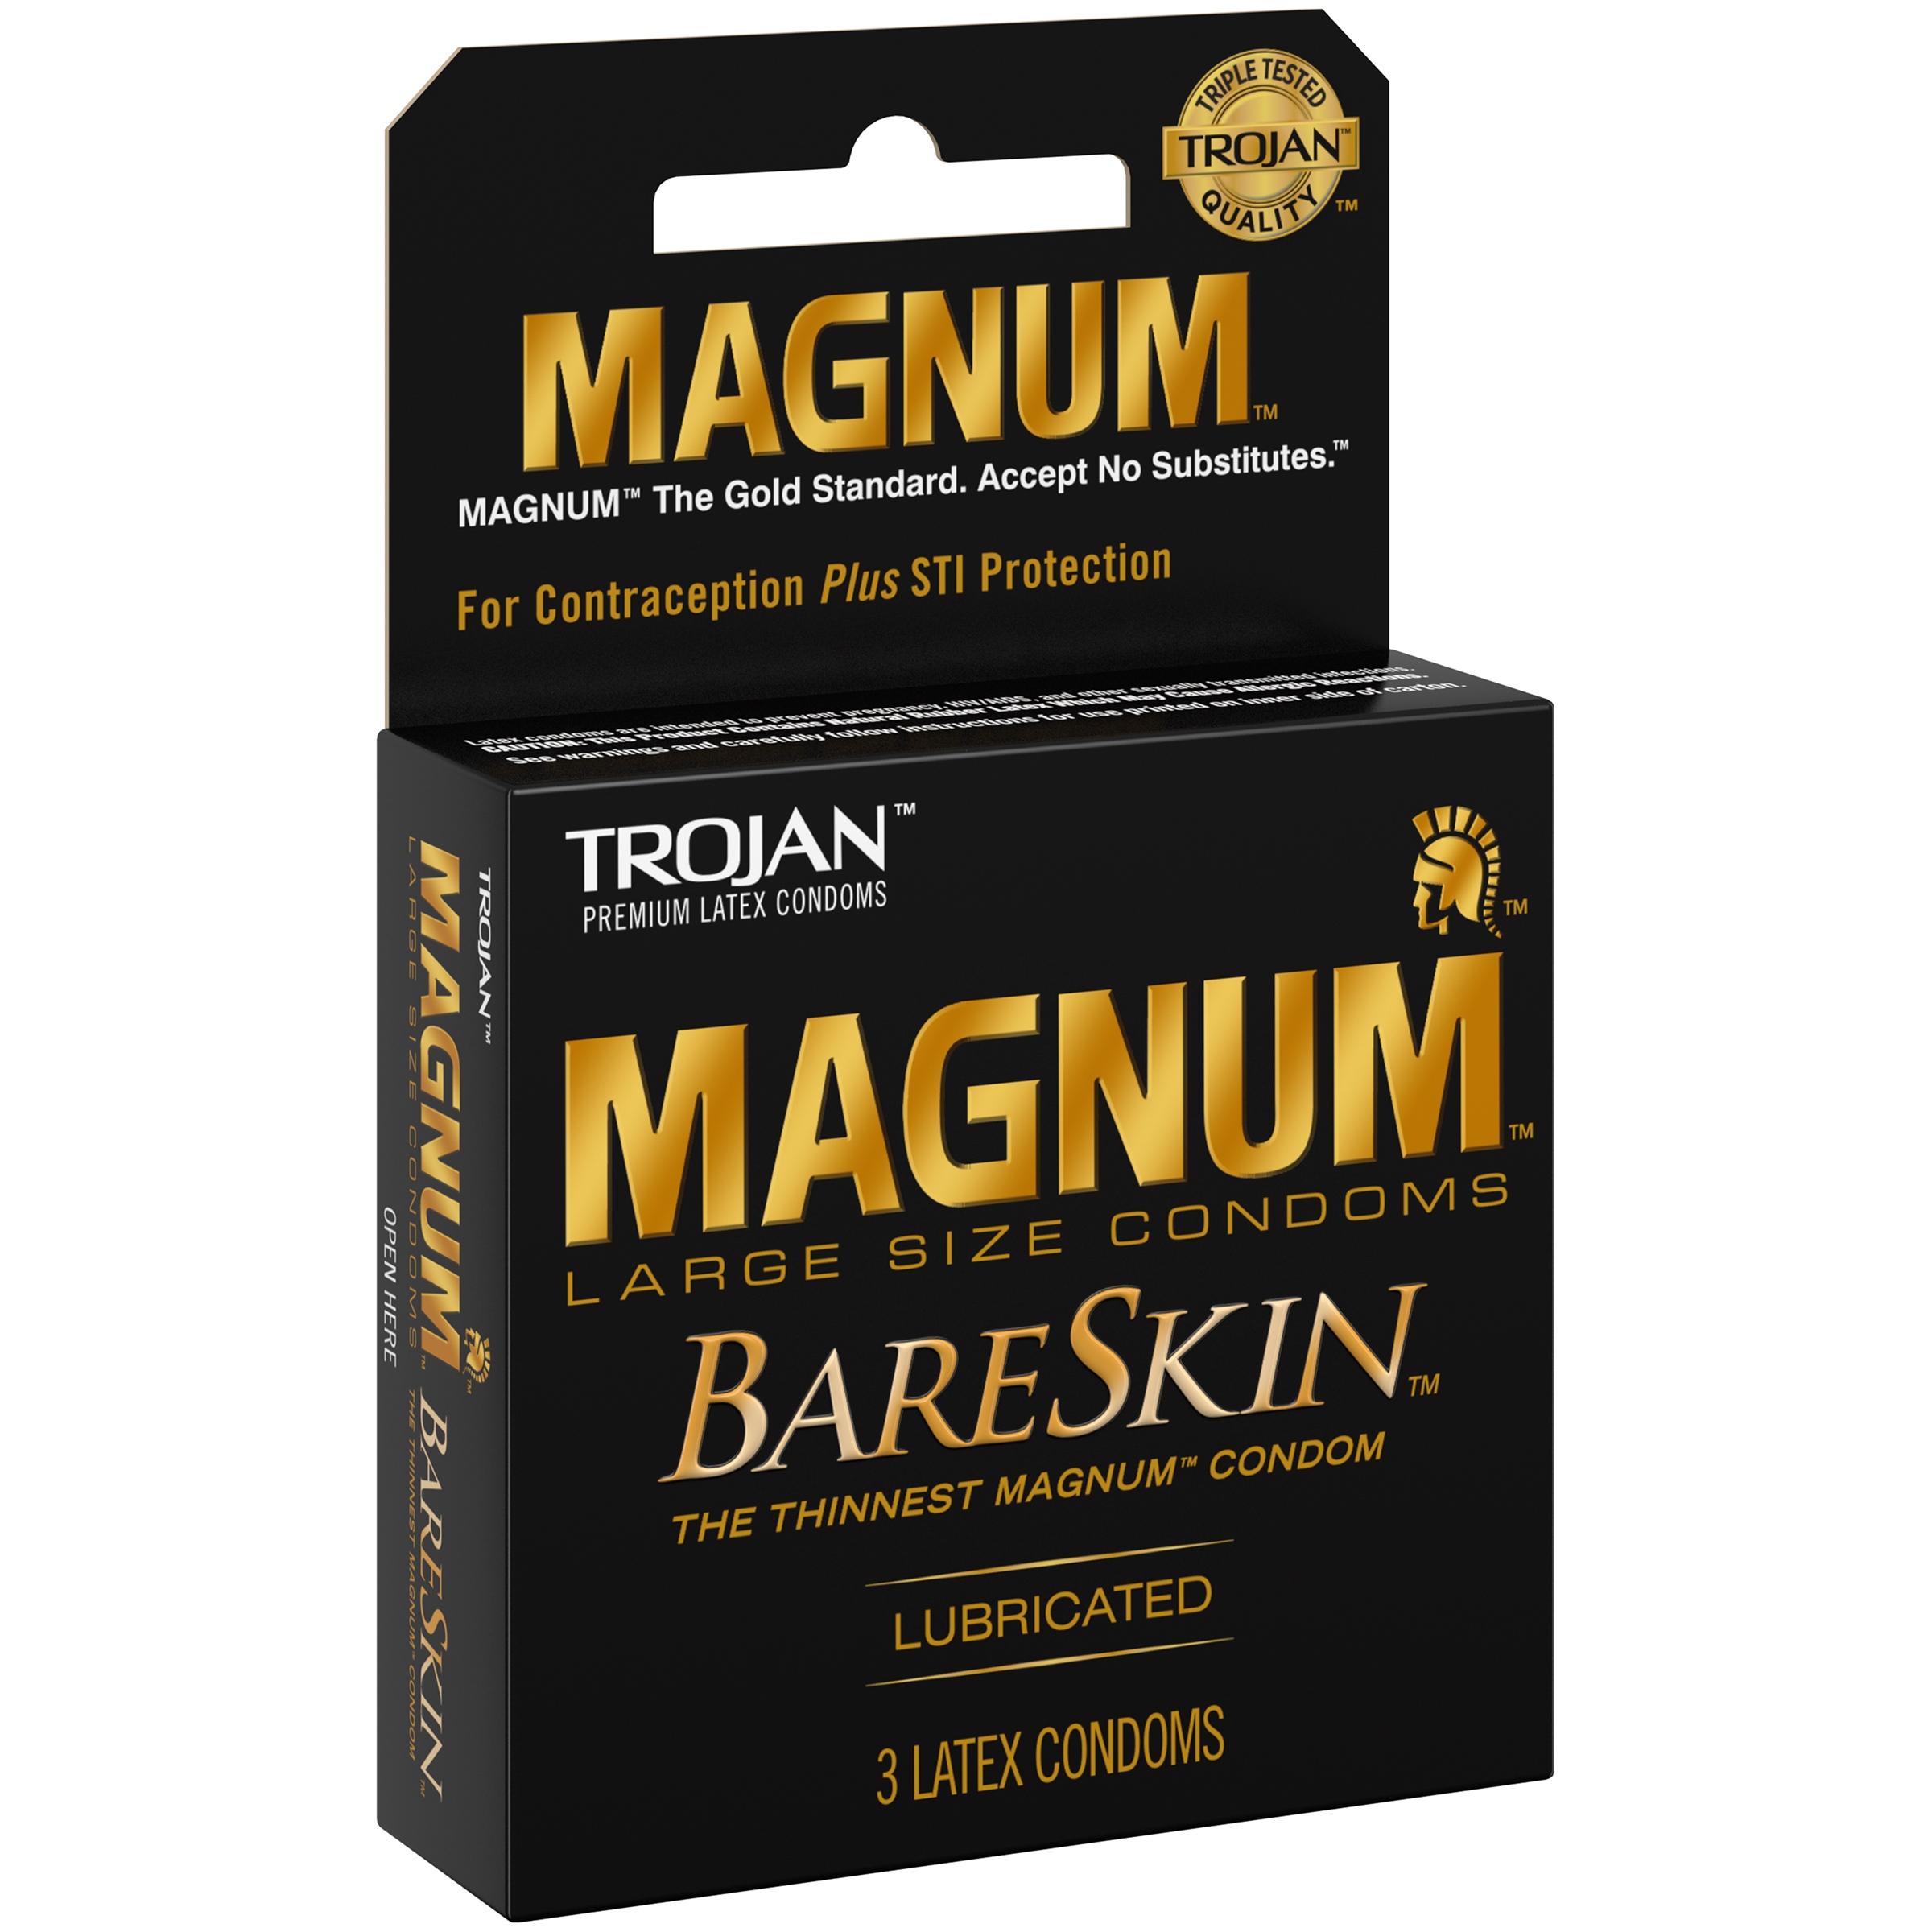 Trojan™ Magnum™ Bareskin™ Condom 3 ct Box.